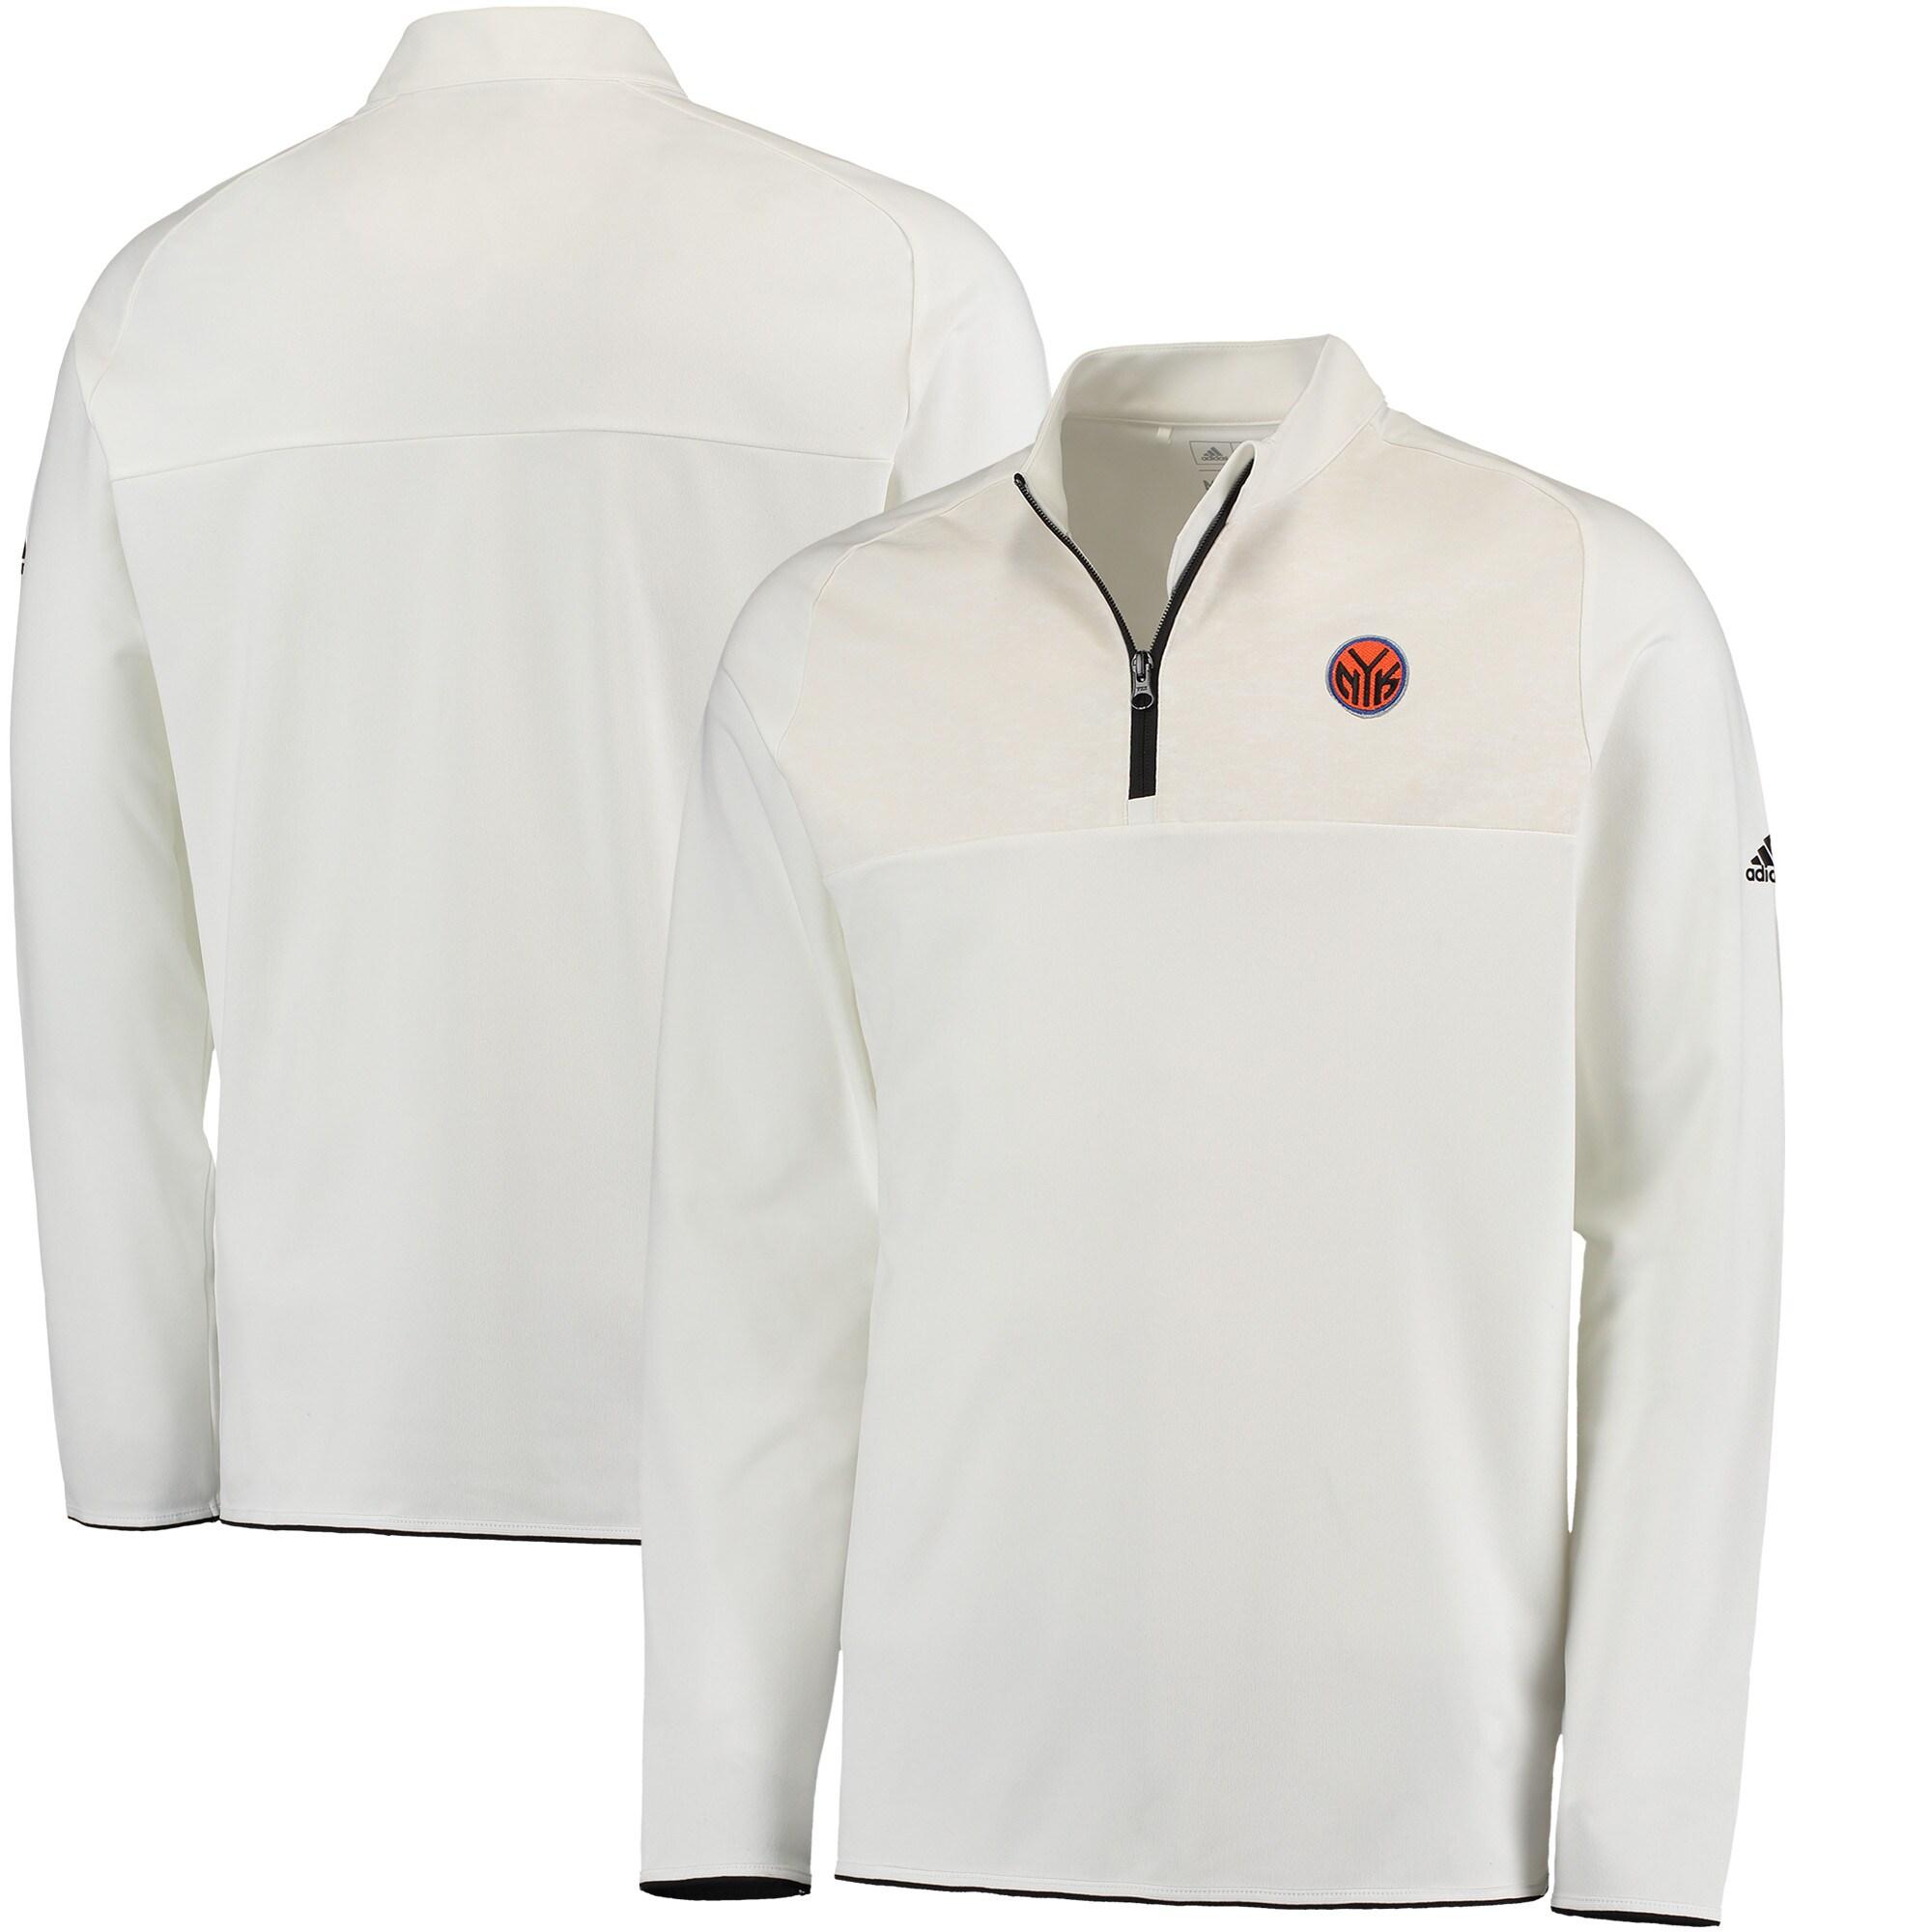 New York Knicks adidas Fashion 2 Layering climawarm Pullover Jacket - White